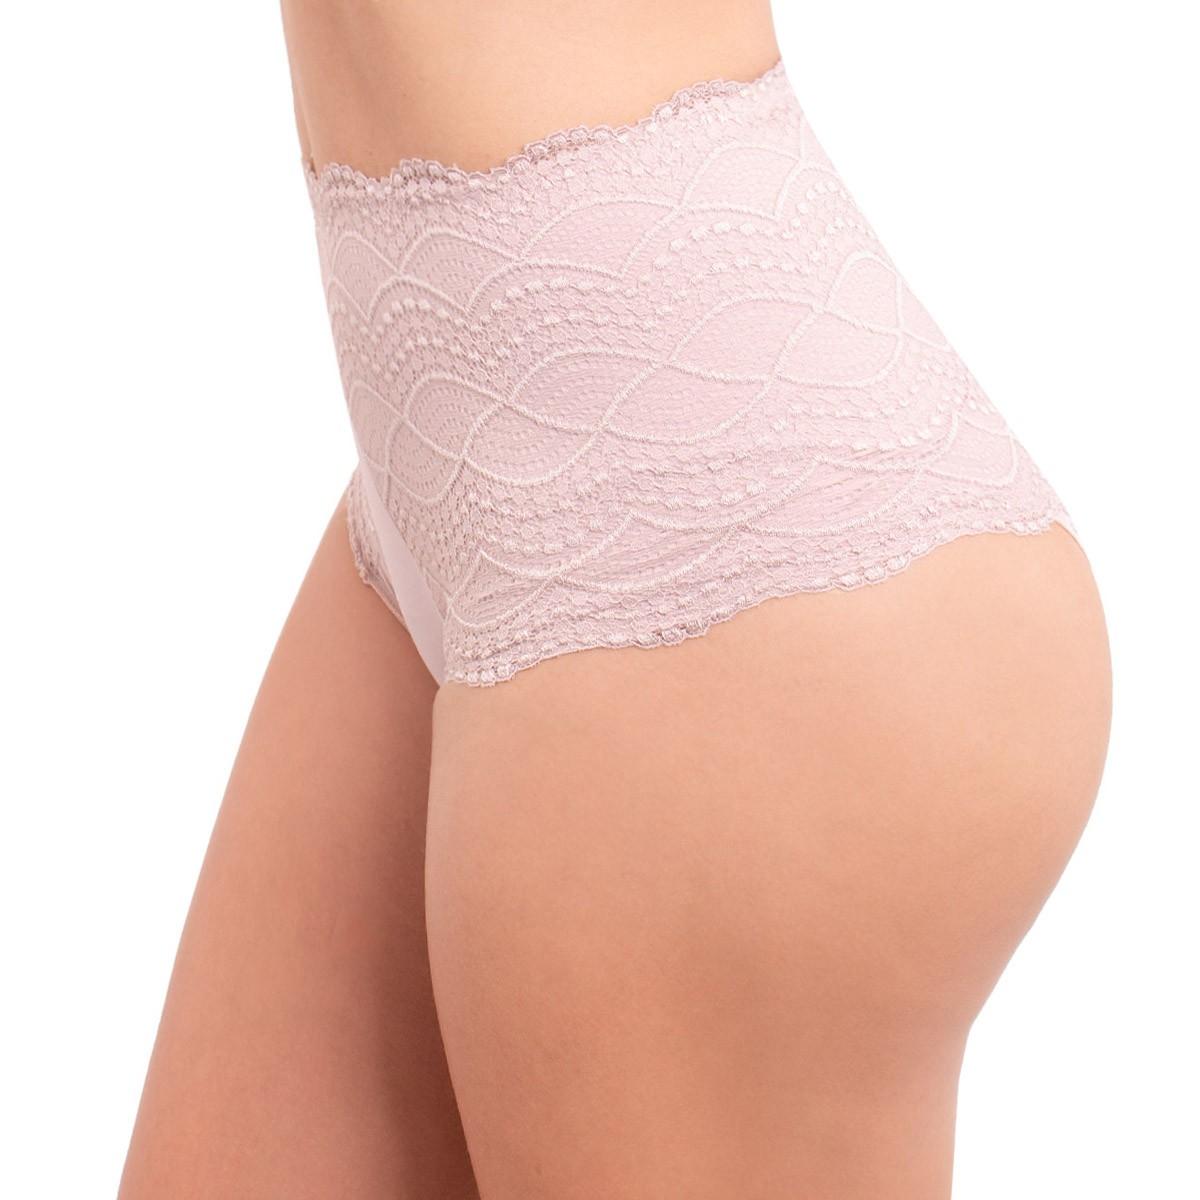 Calcinha modelo tanga cintura alta rendada Nayane Rodrigues